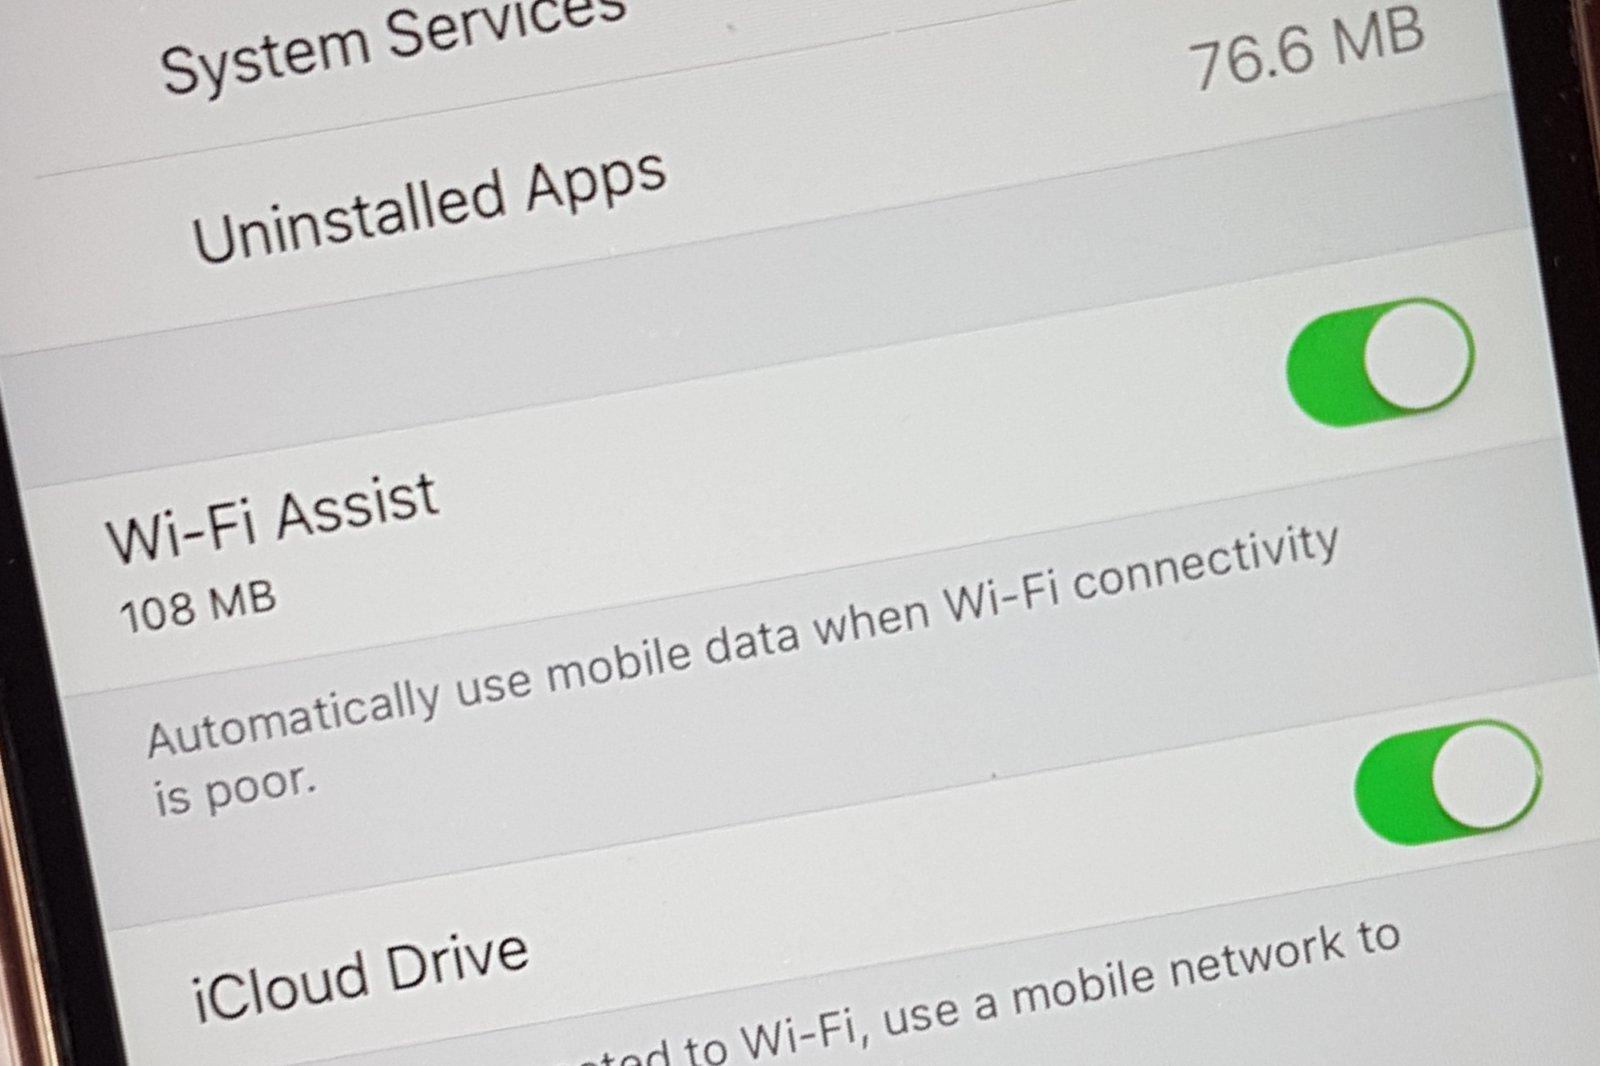 iPhone users: Beware Wi-Fi Assist!